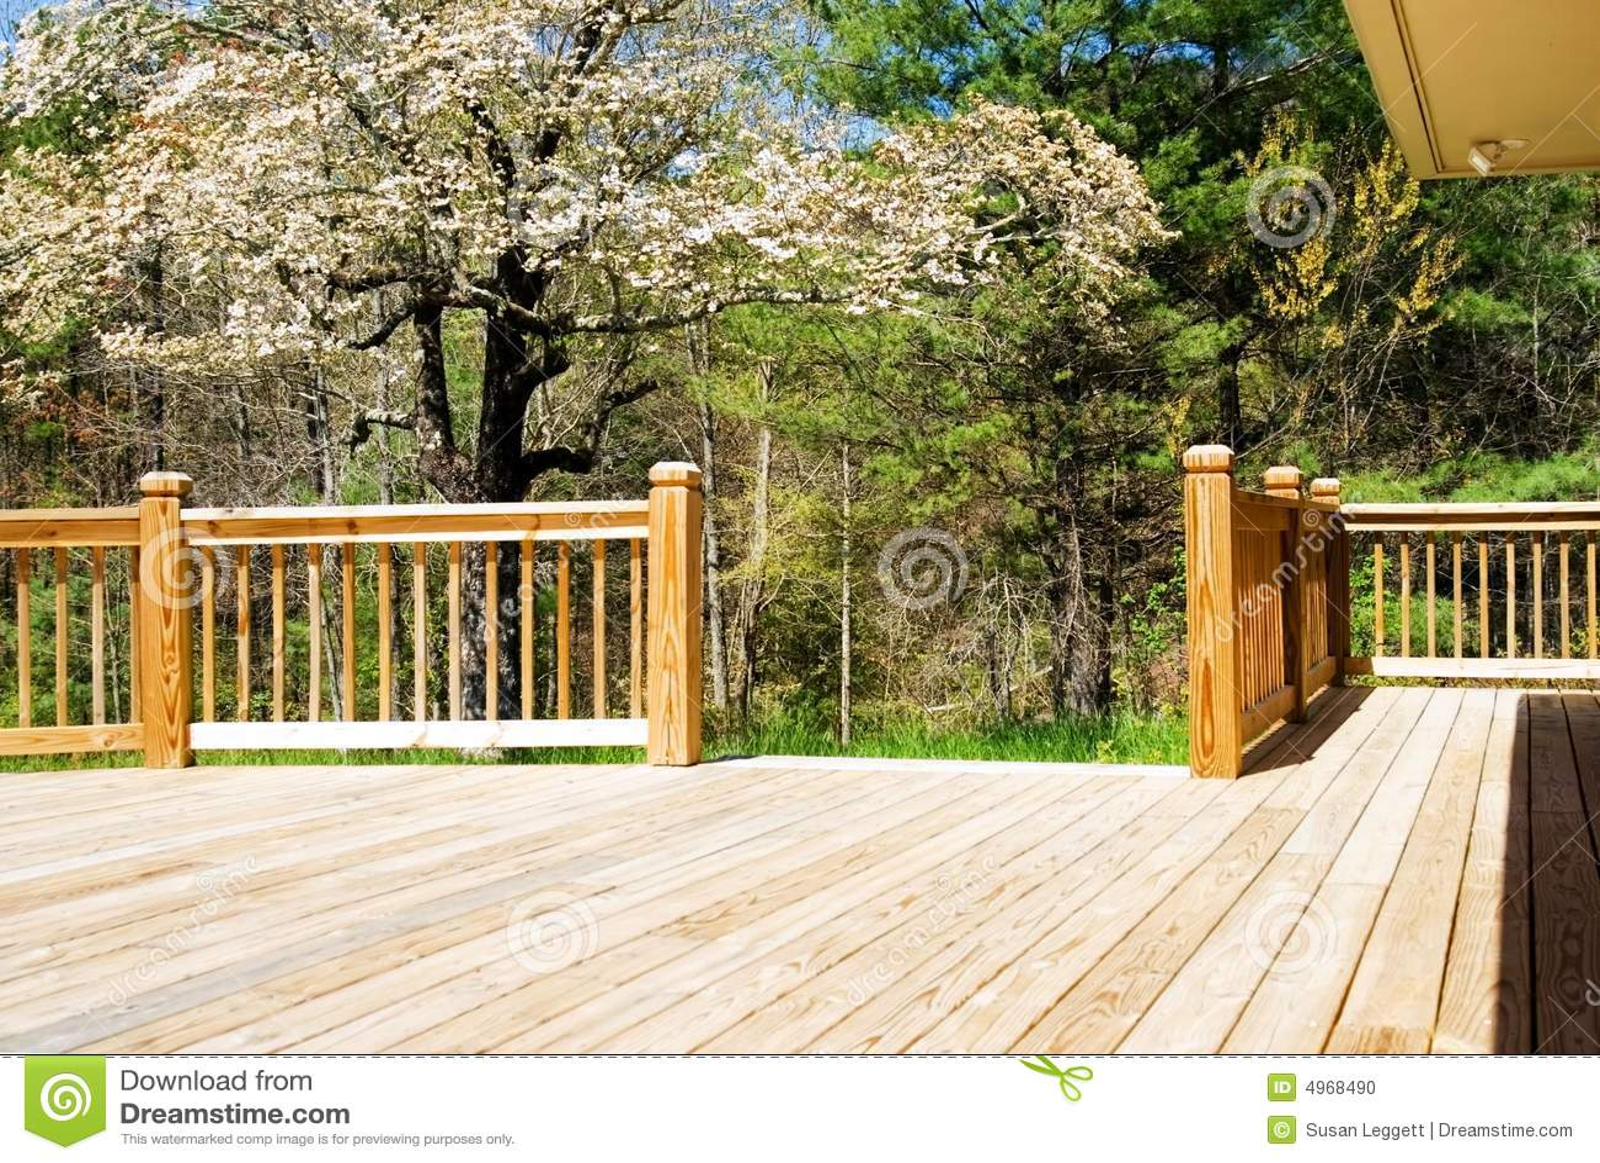 Wood deck in spring/wide